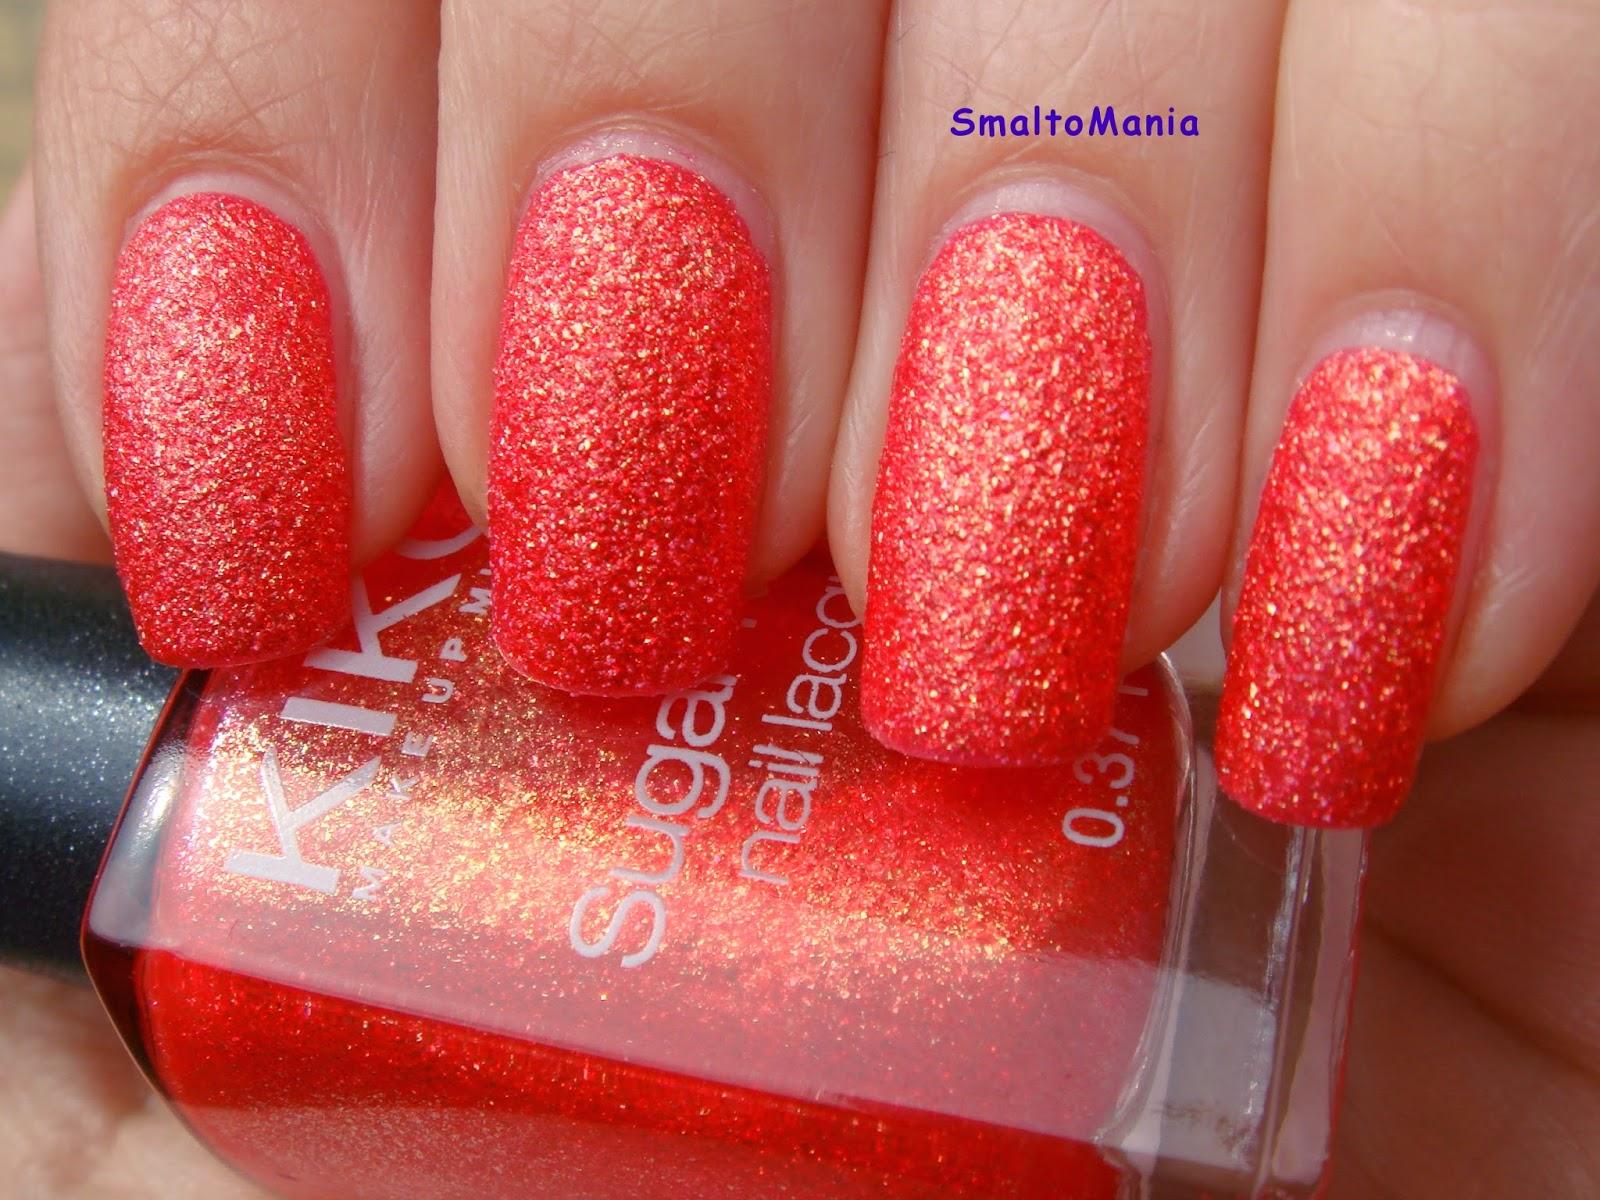 Kiko Sugar Mat n.640 Rosso Papavero